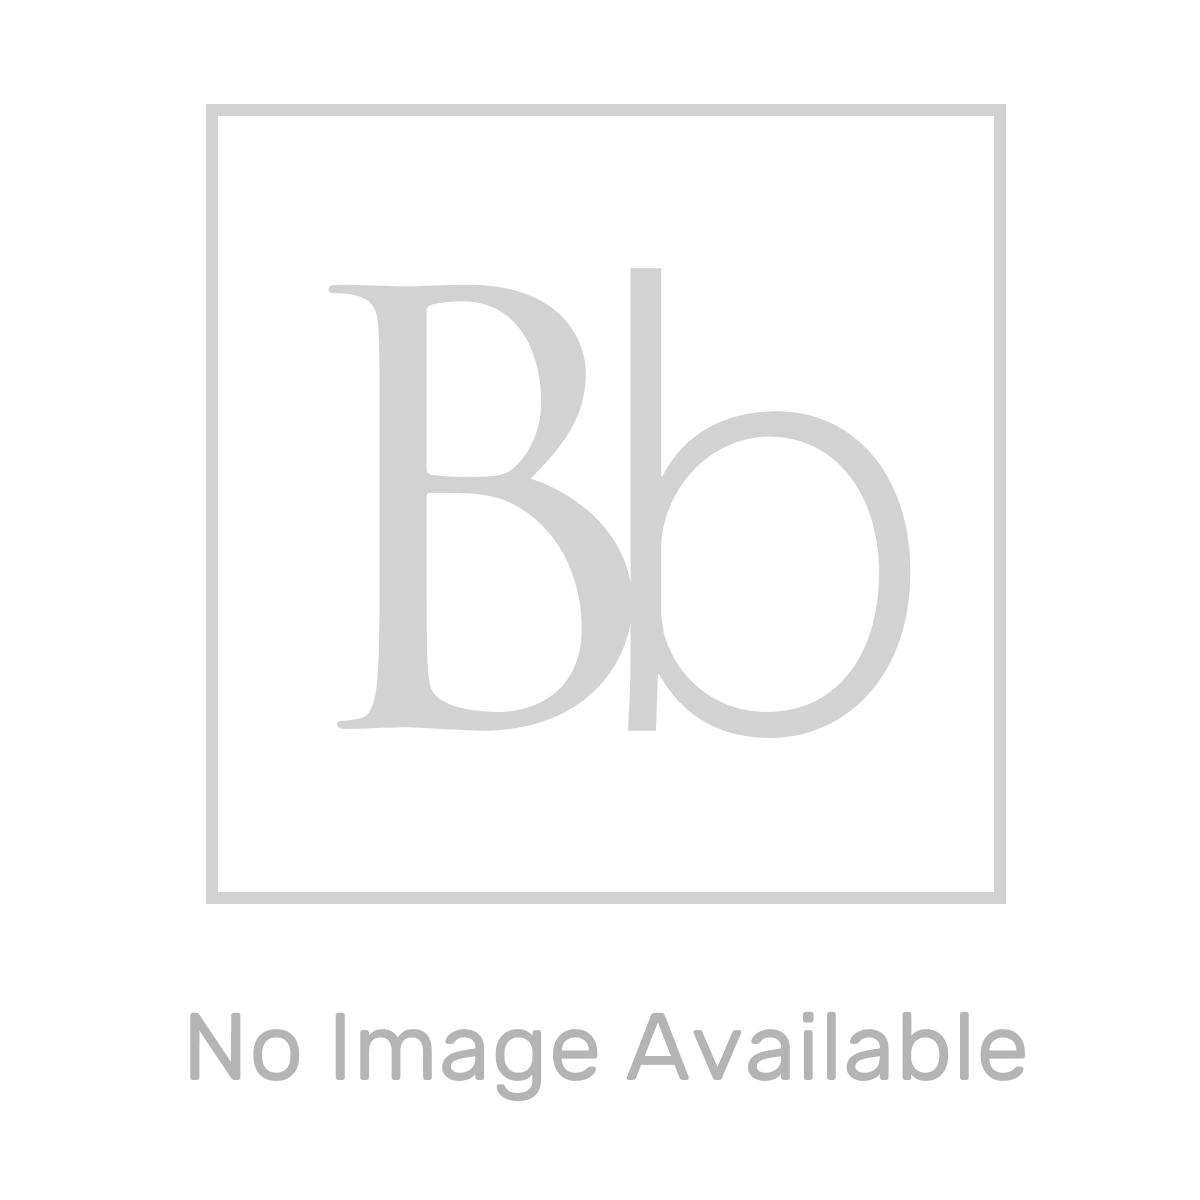 RAK Series 600 Close Coupled Toilet